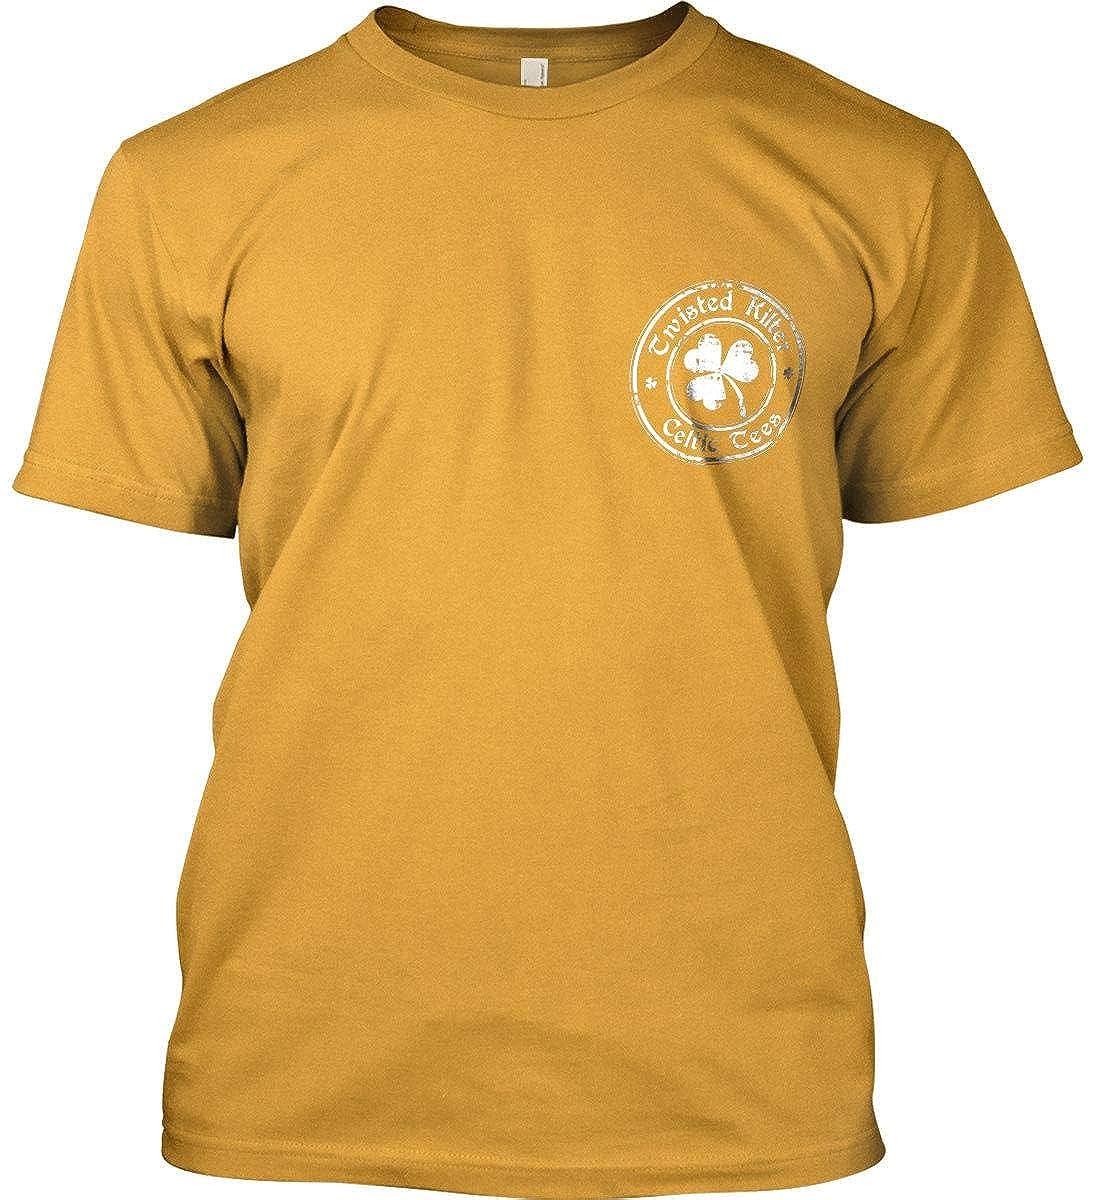 The Taranis Celtic T-Shirt Sons Of Liberty Twisted Kilter Tees: Celtic Tribal Design Gilda.